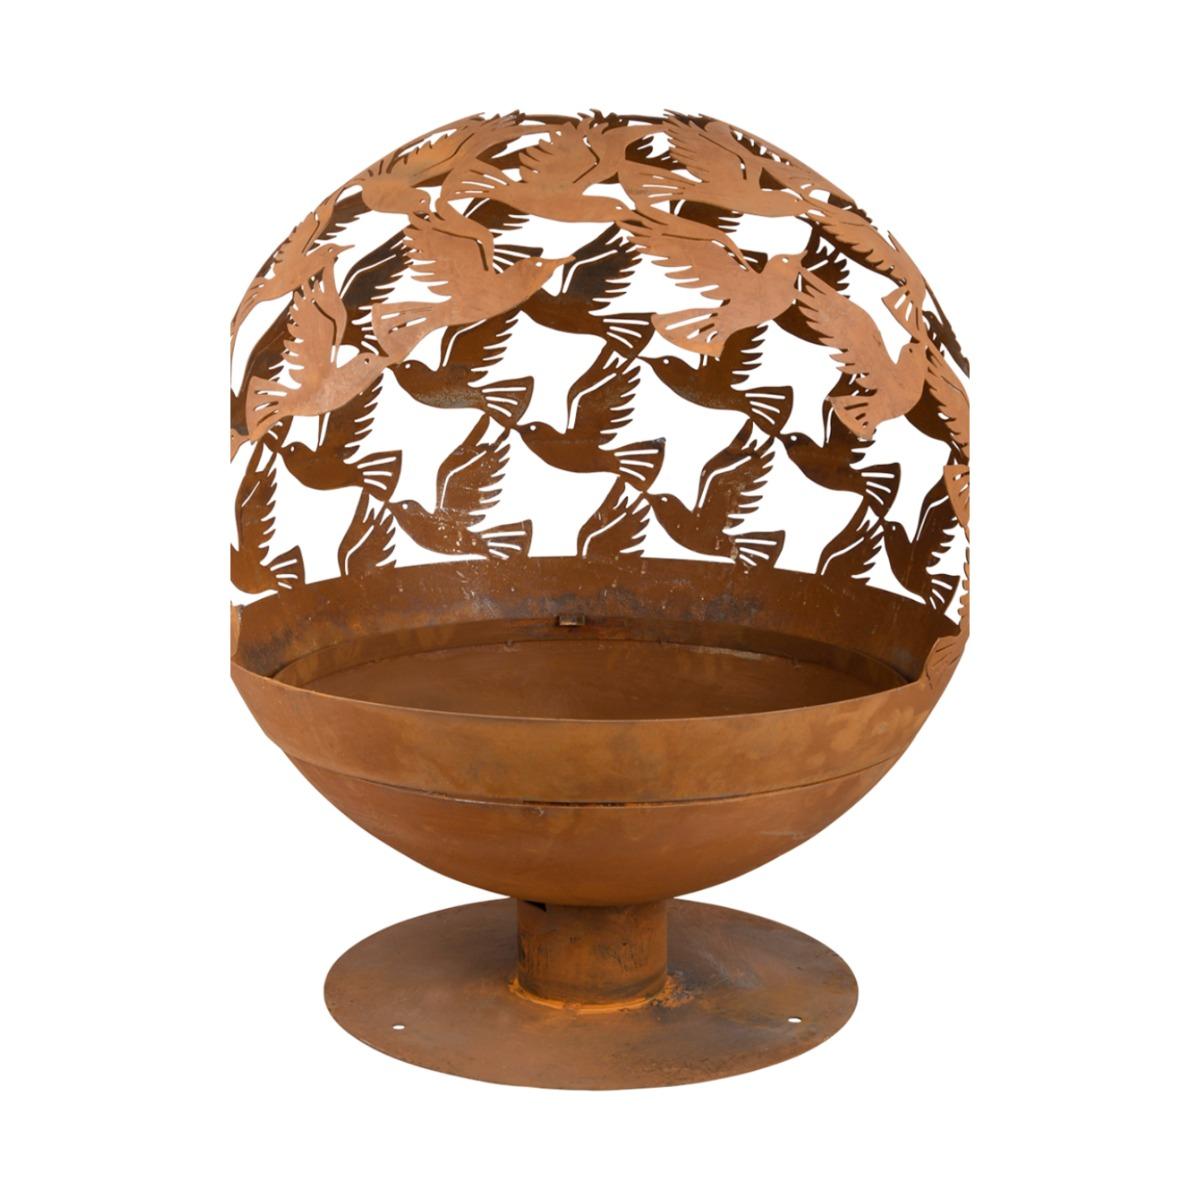 Vuurkorf type vuurbal design vogels - roest